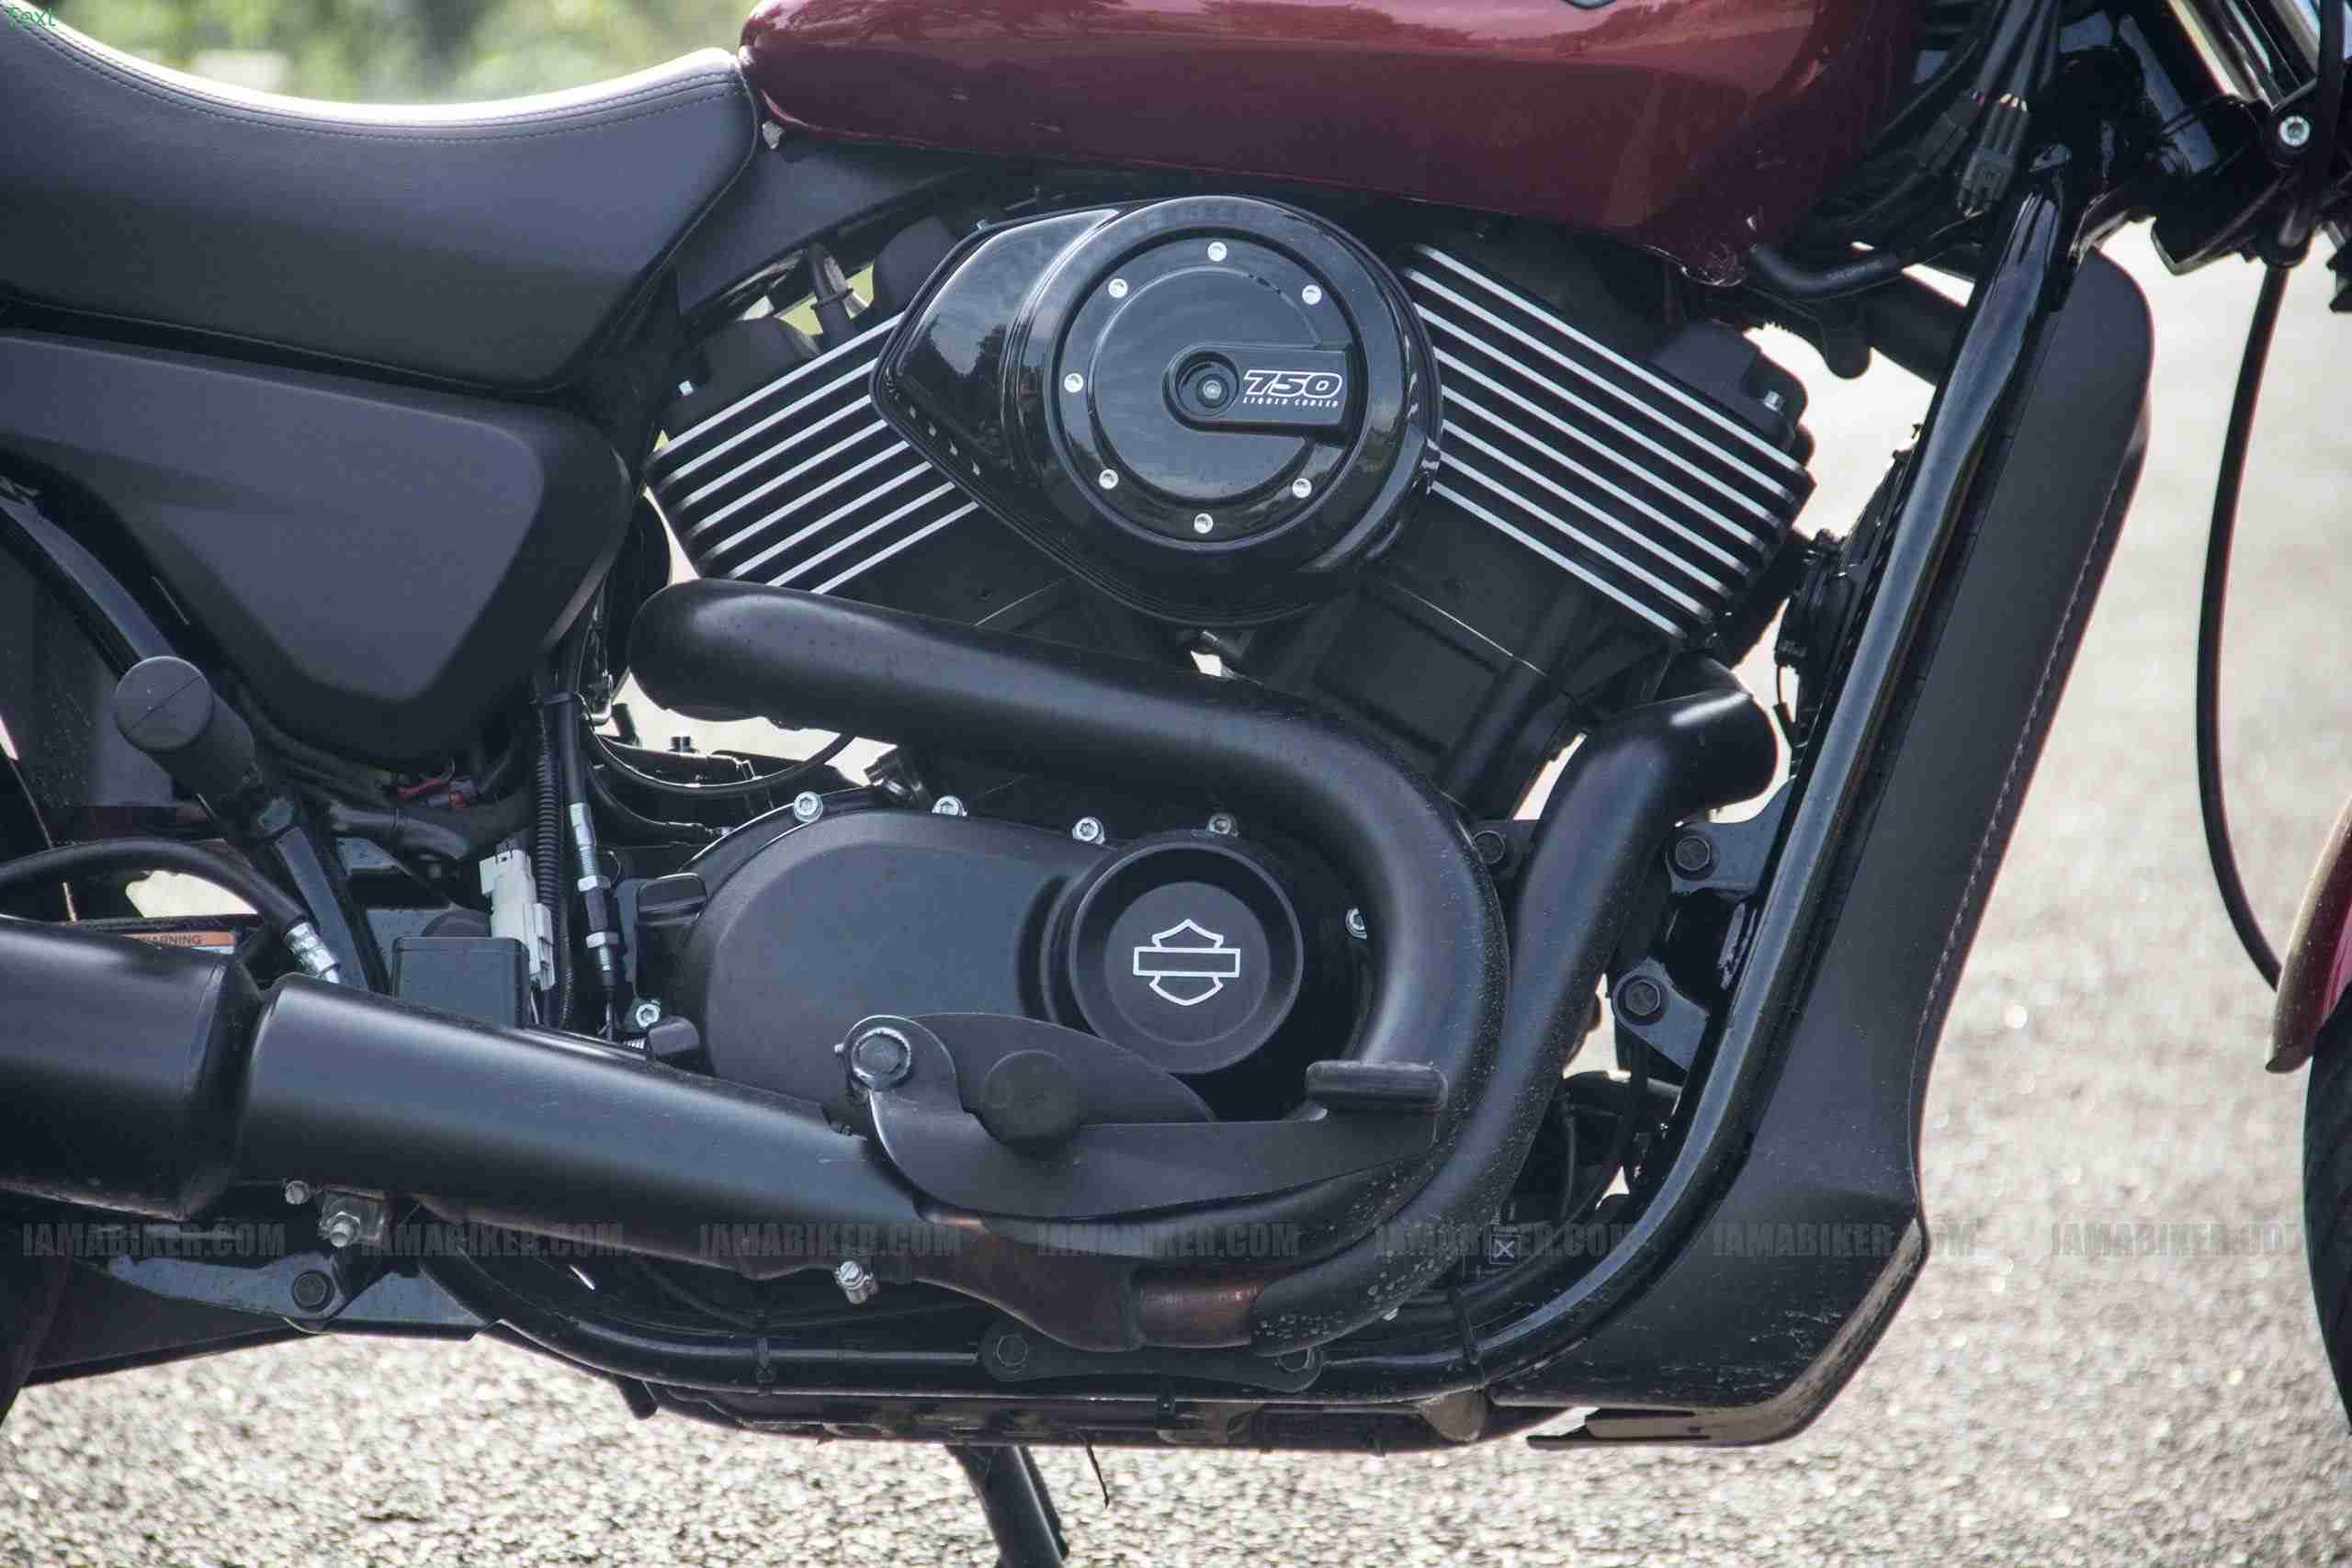 2015 Harley Davidson Street 750 review - 14